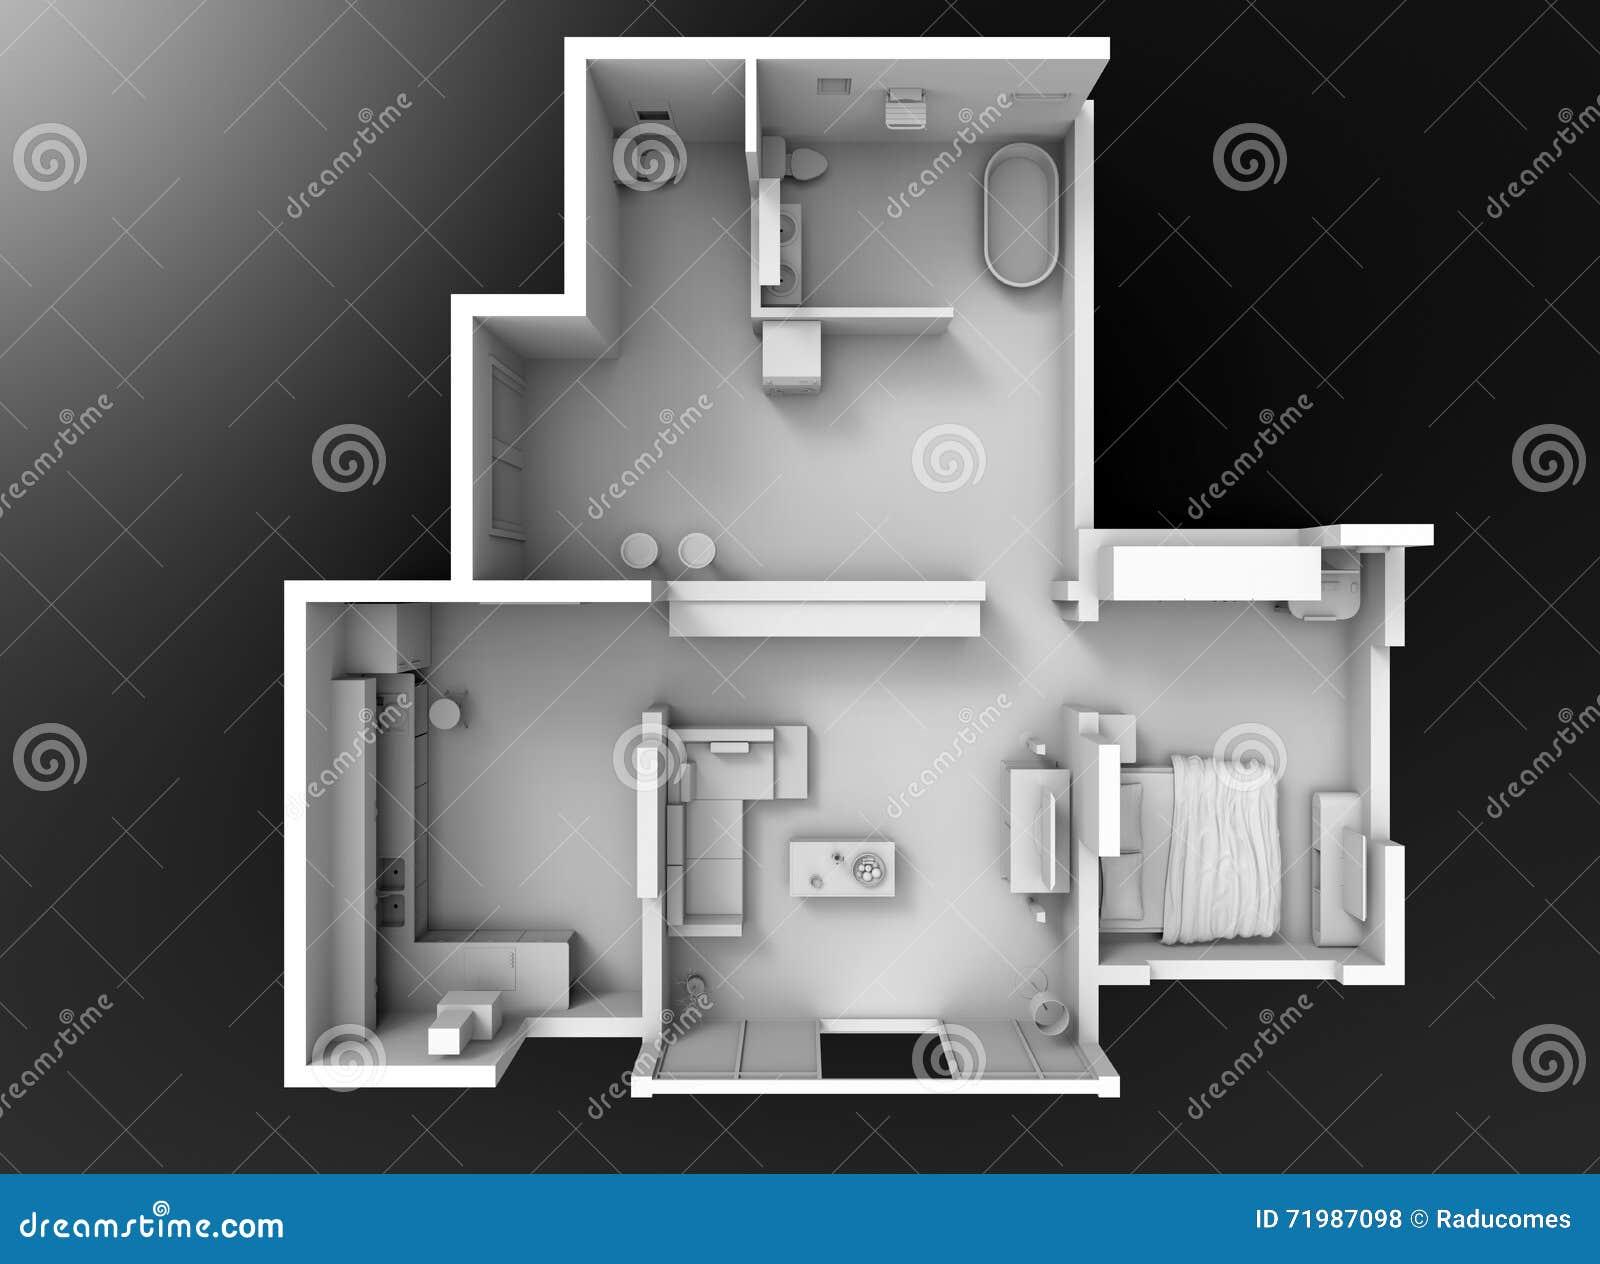 3d Floor Plan Section Stock Illustration Illustration Of Project 71987098